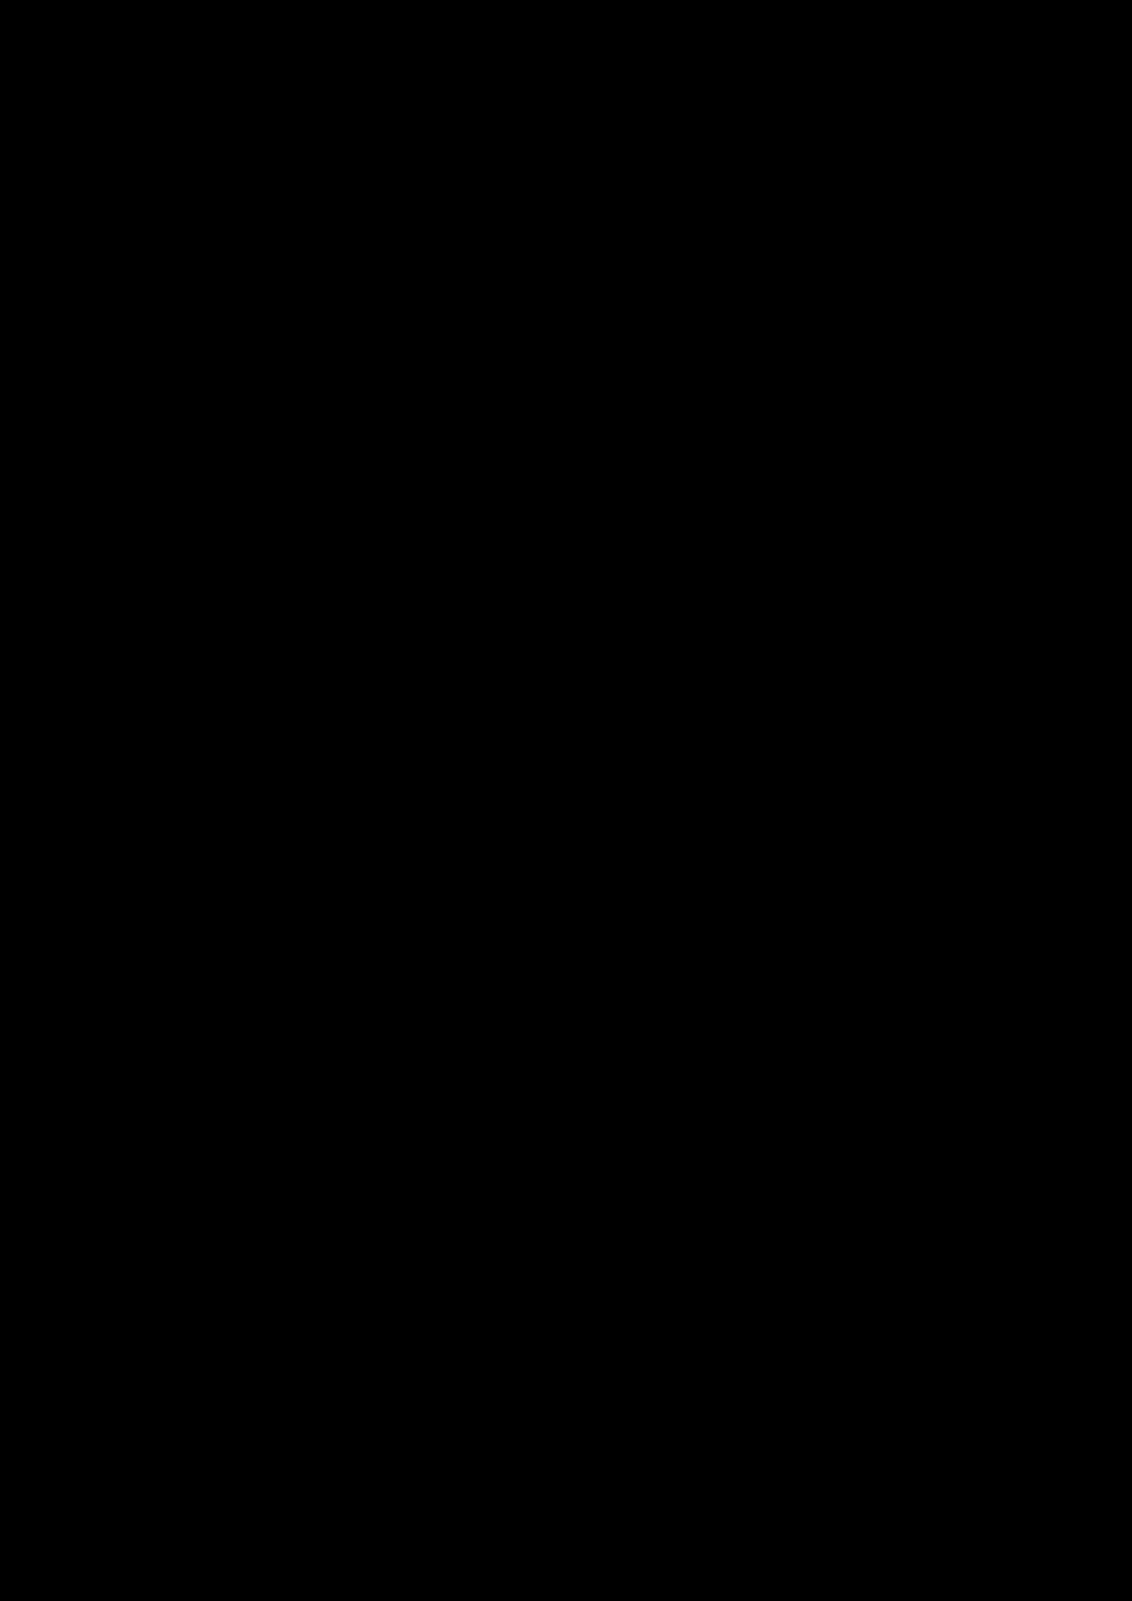 Ot Bolshogo Uma slide, Image 9